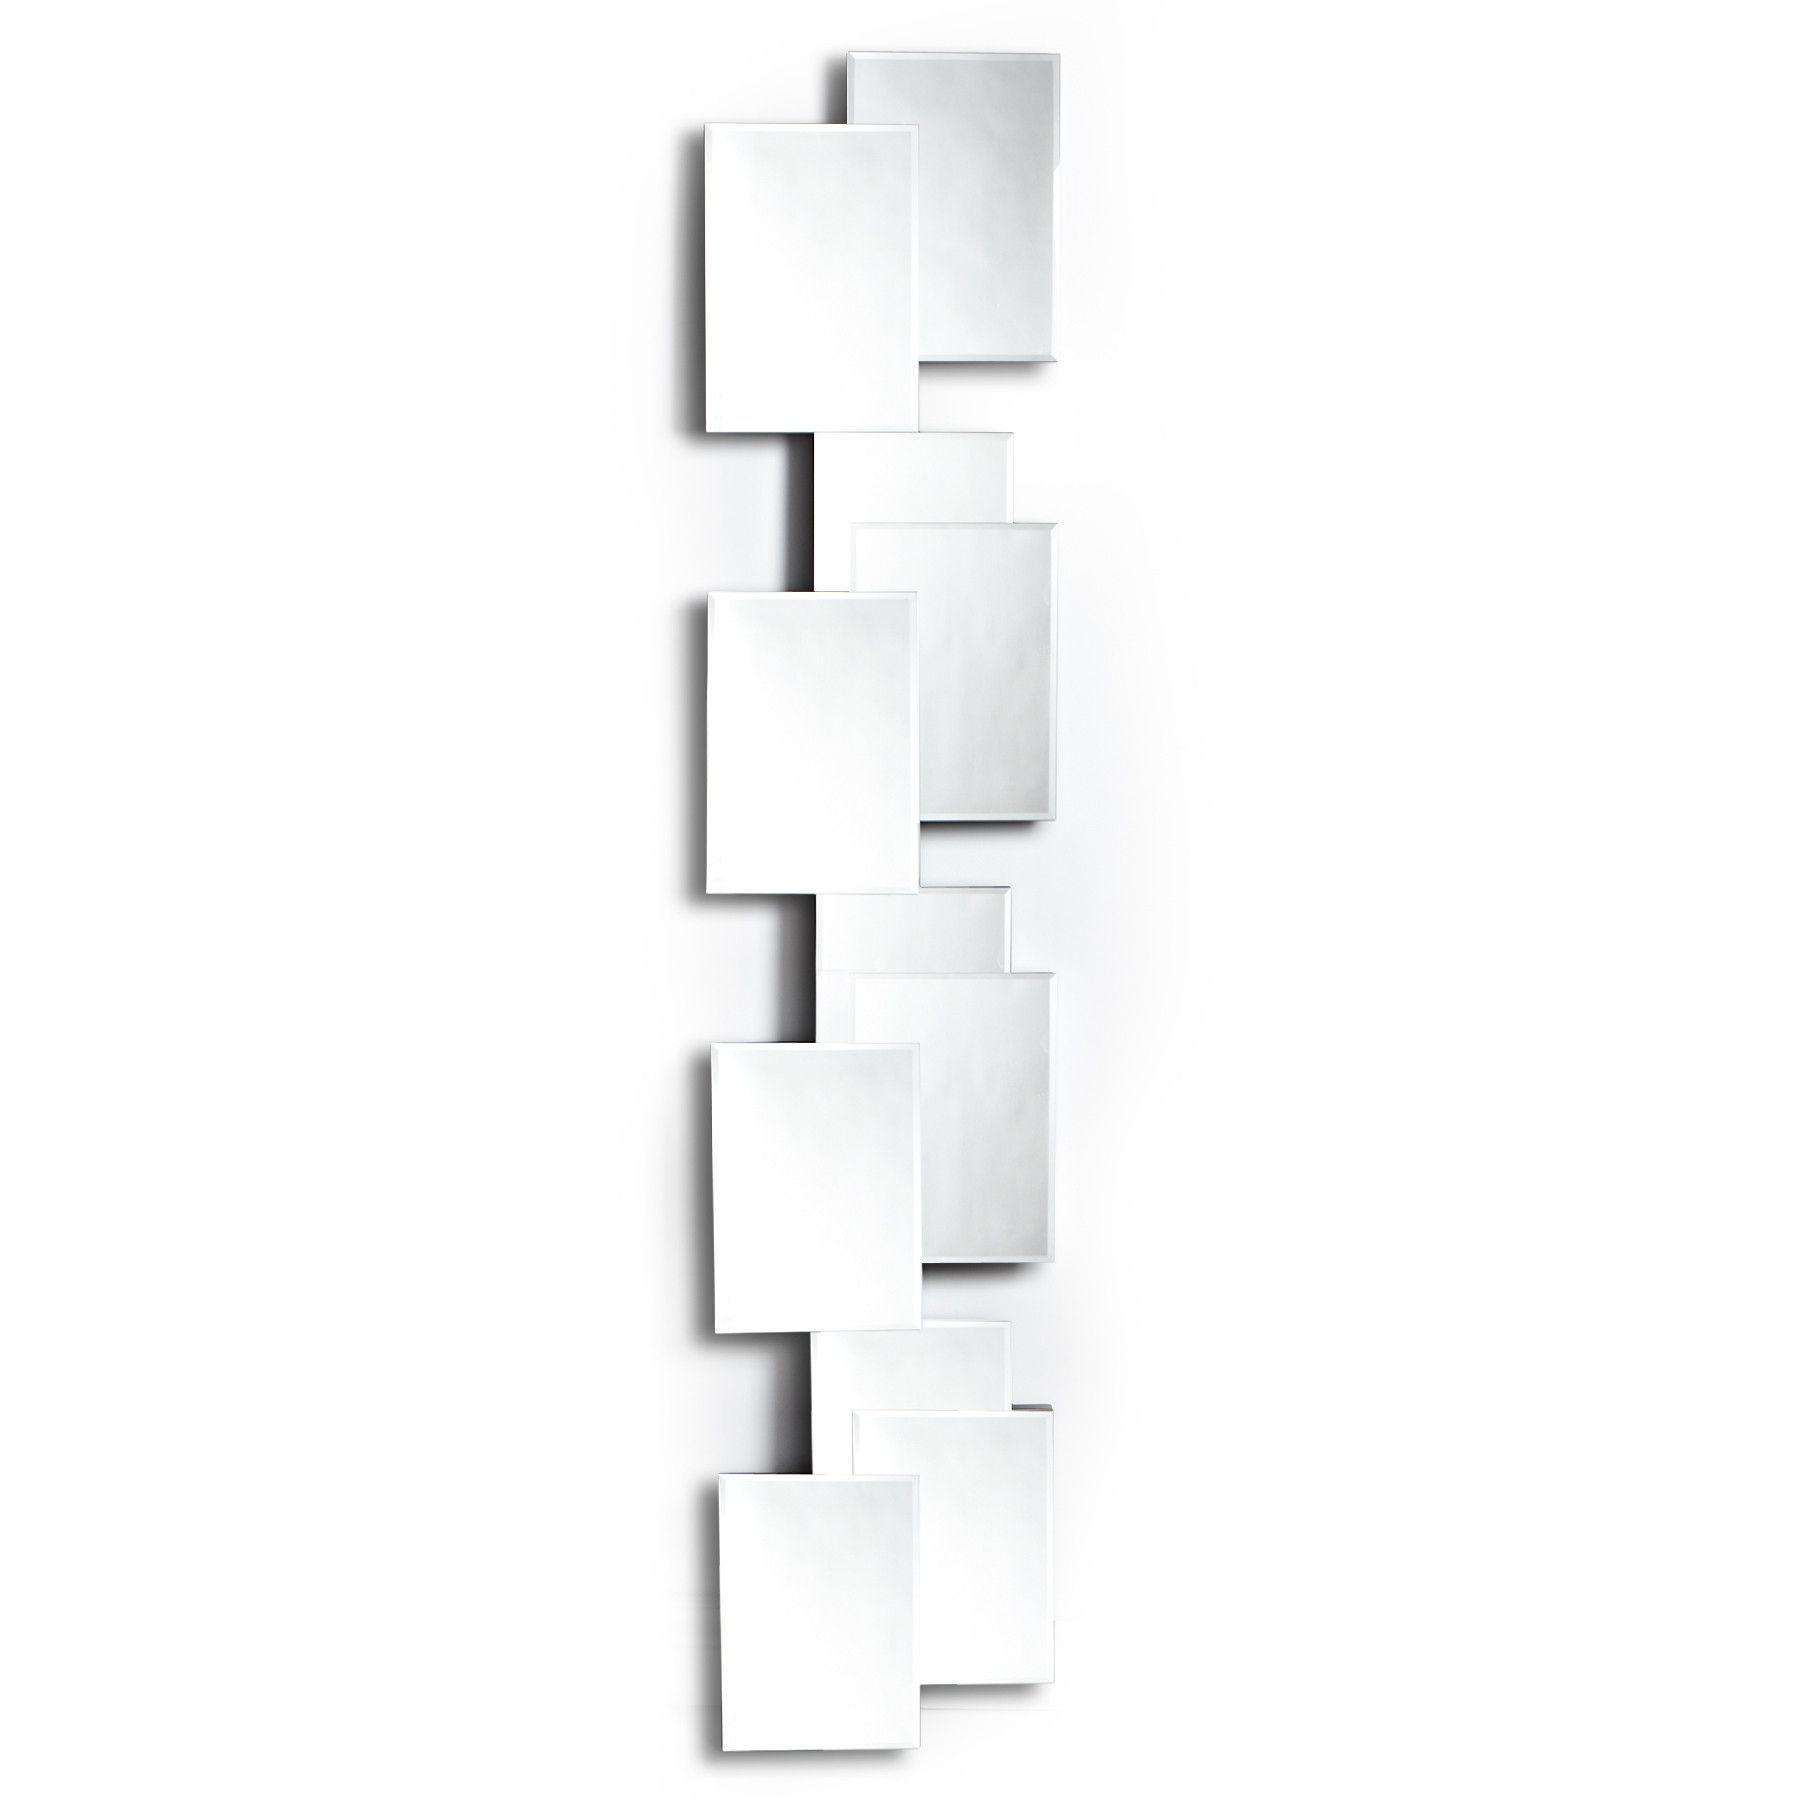 70 Glass Long Narrow Squares Wall Mirror Black Wall Mirror